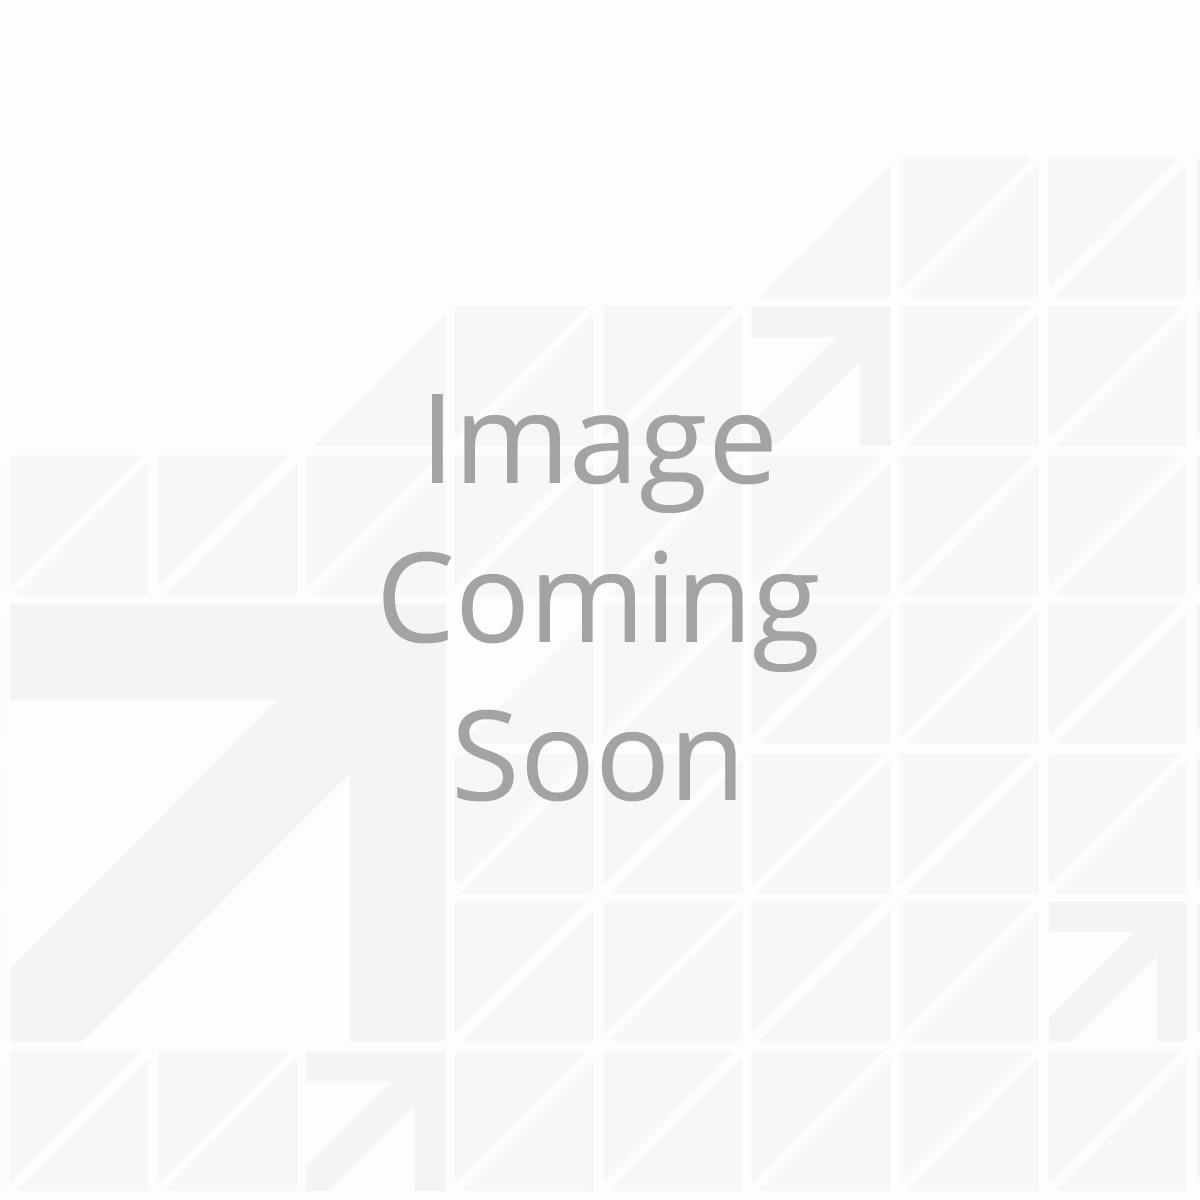 Sunrise Portable RV Deck - Kingston 24 Series